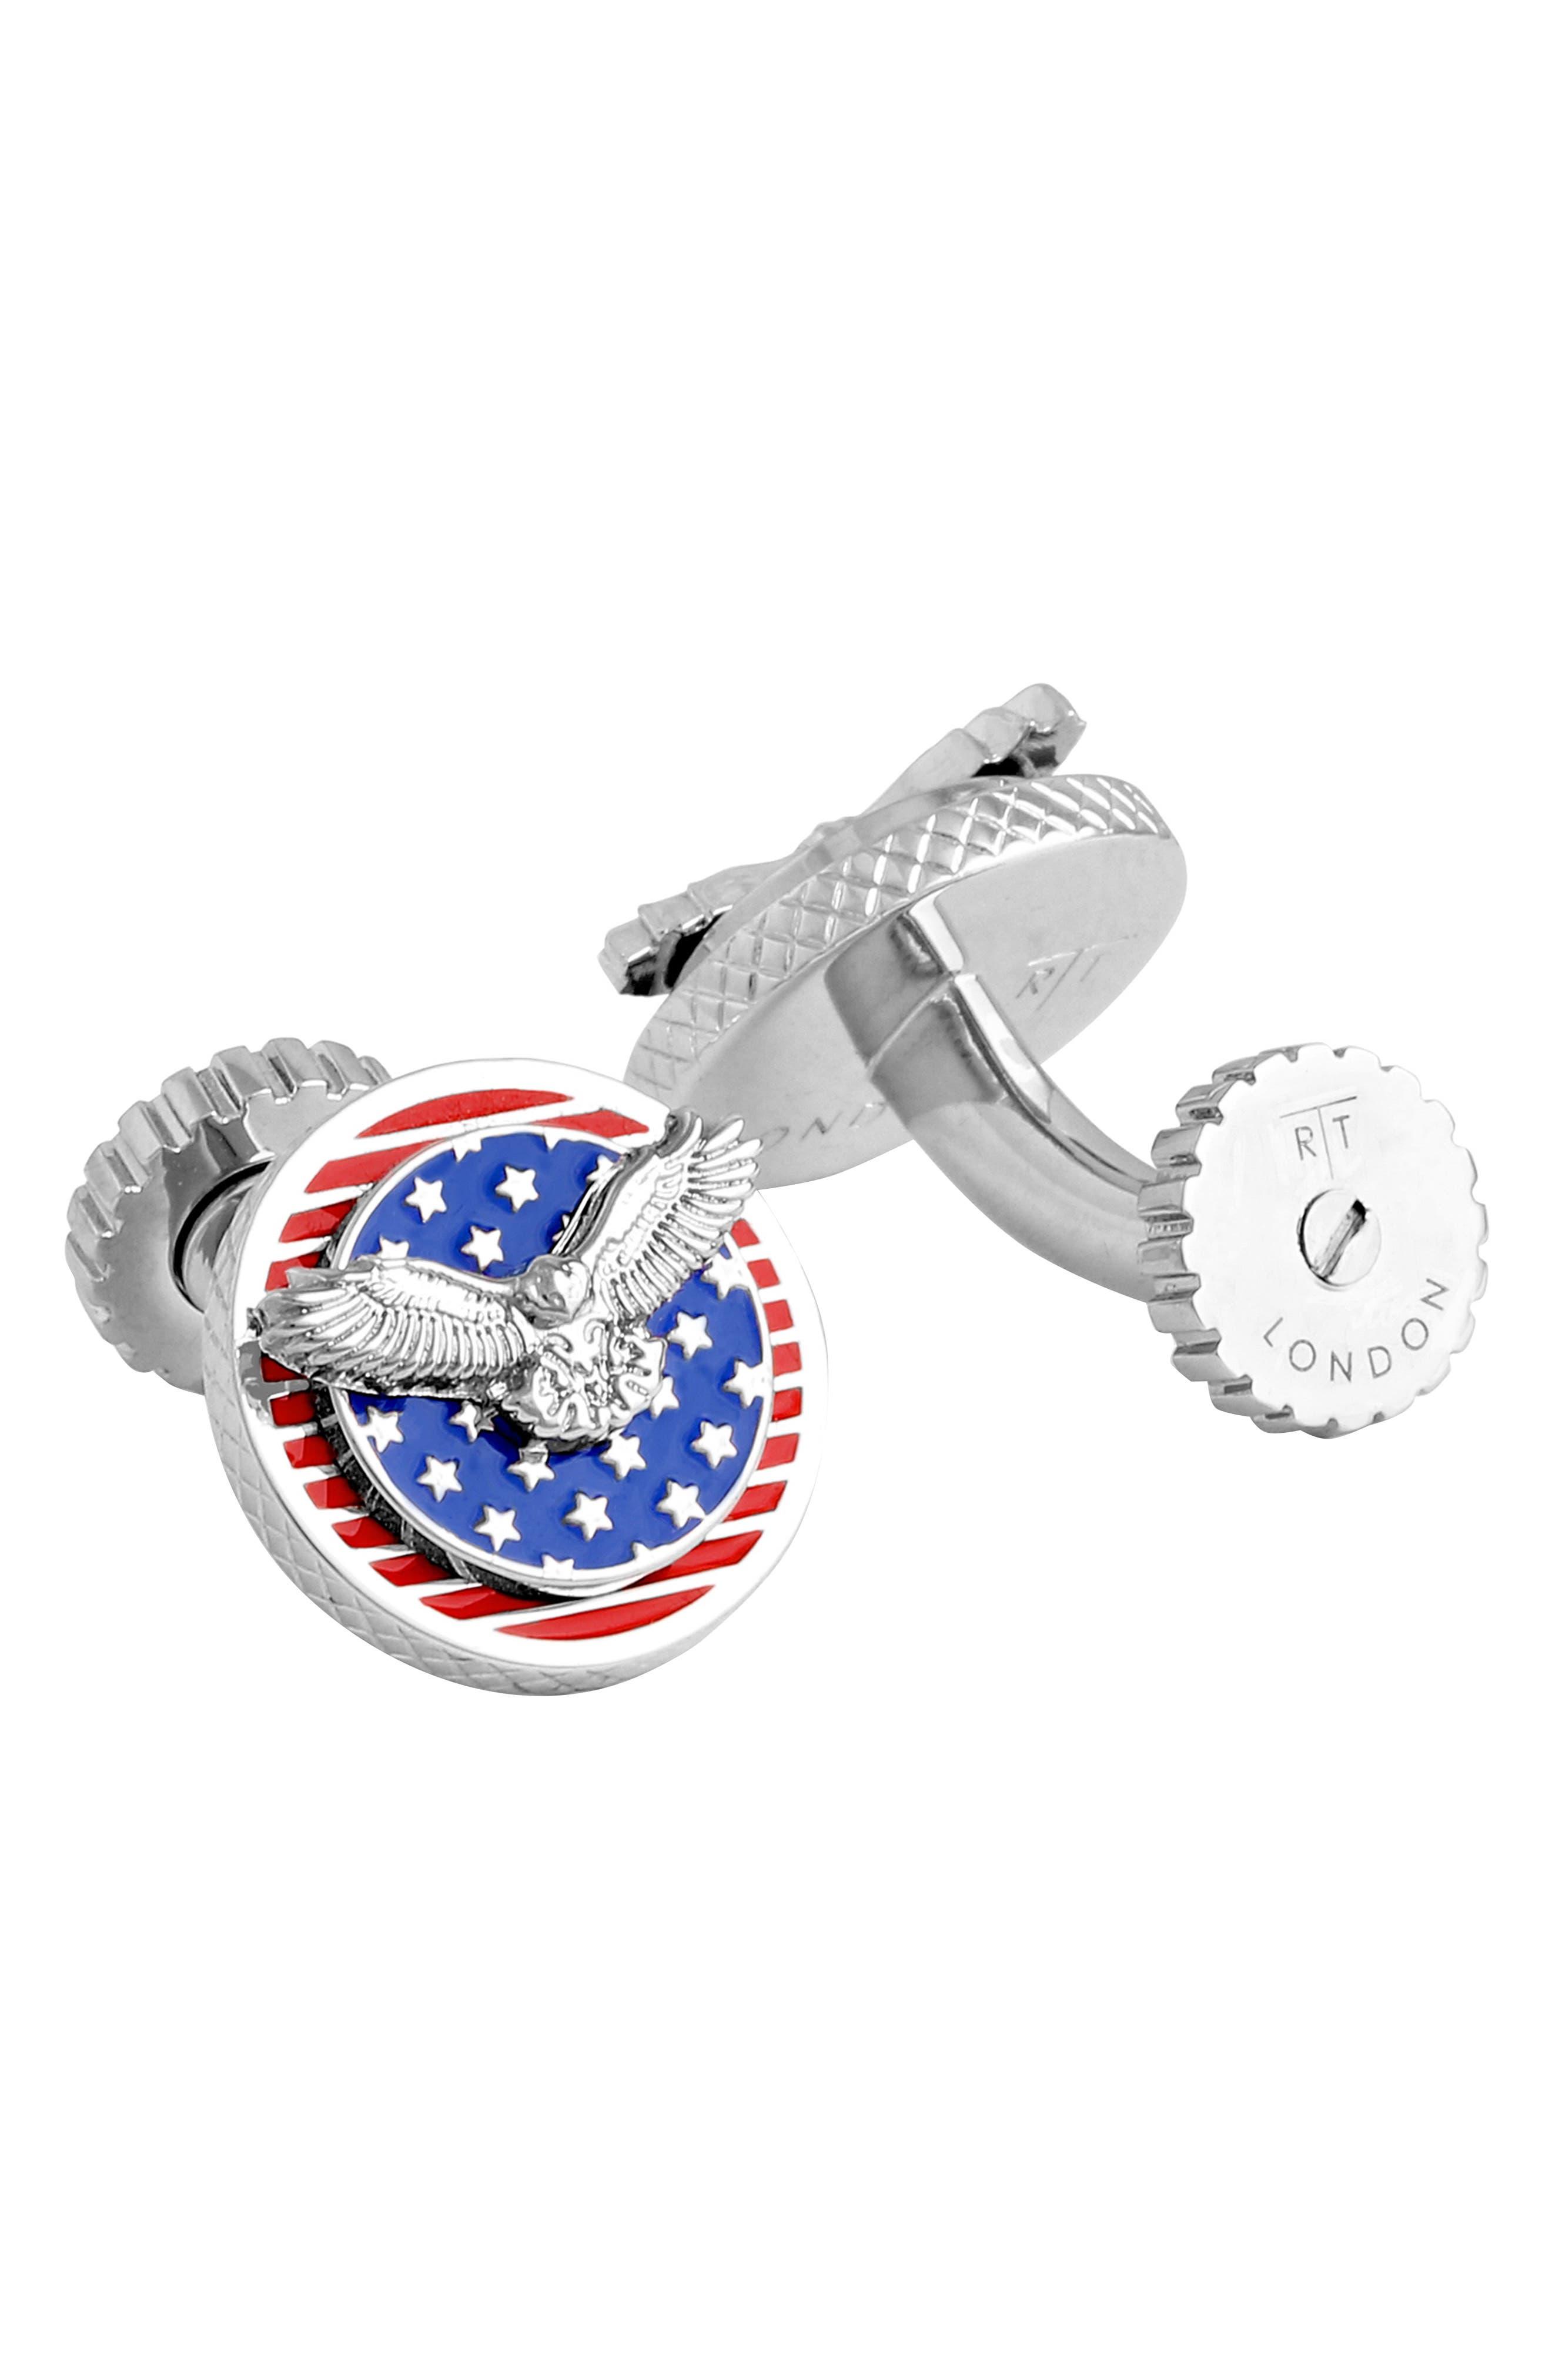 USA Rotating Flag Cuff Links,                             Main thumbnail 1, color,                             012